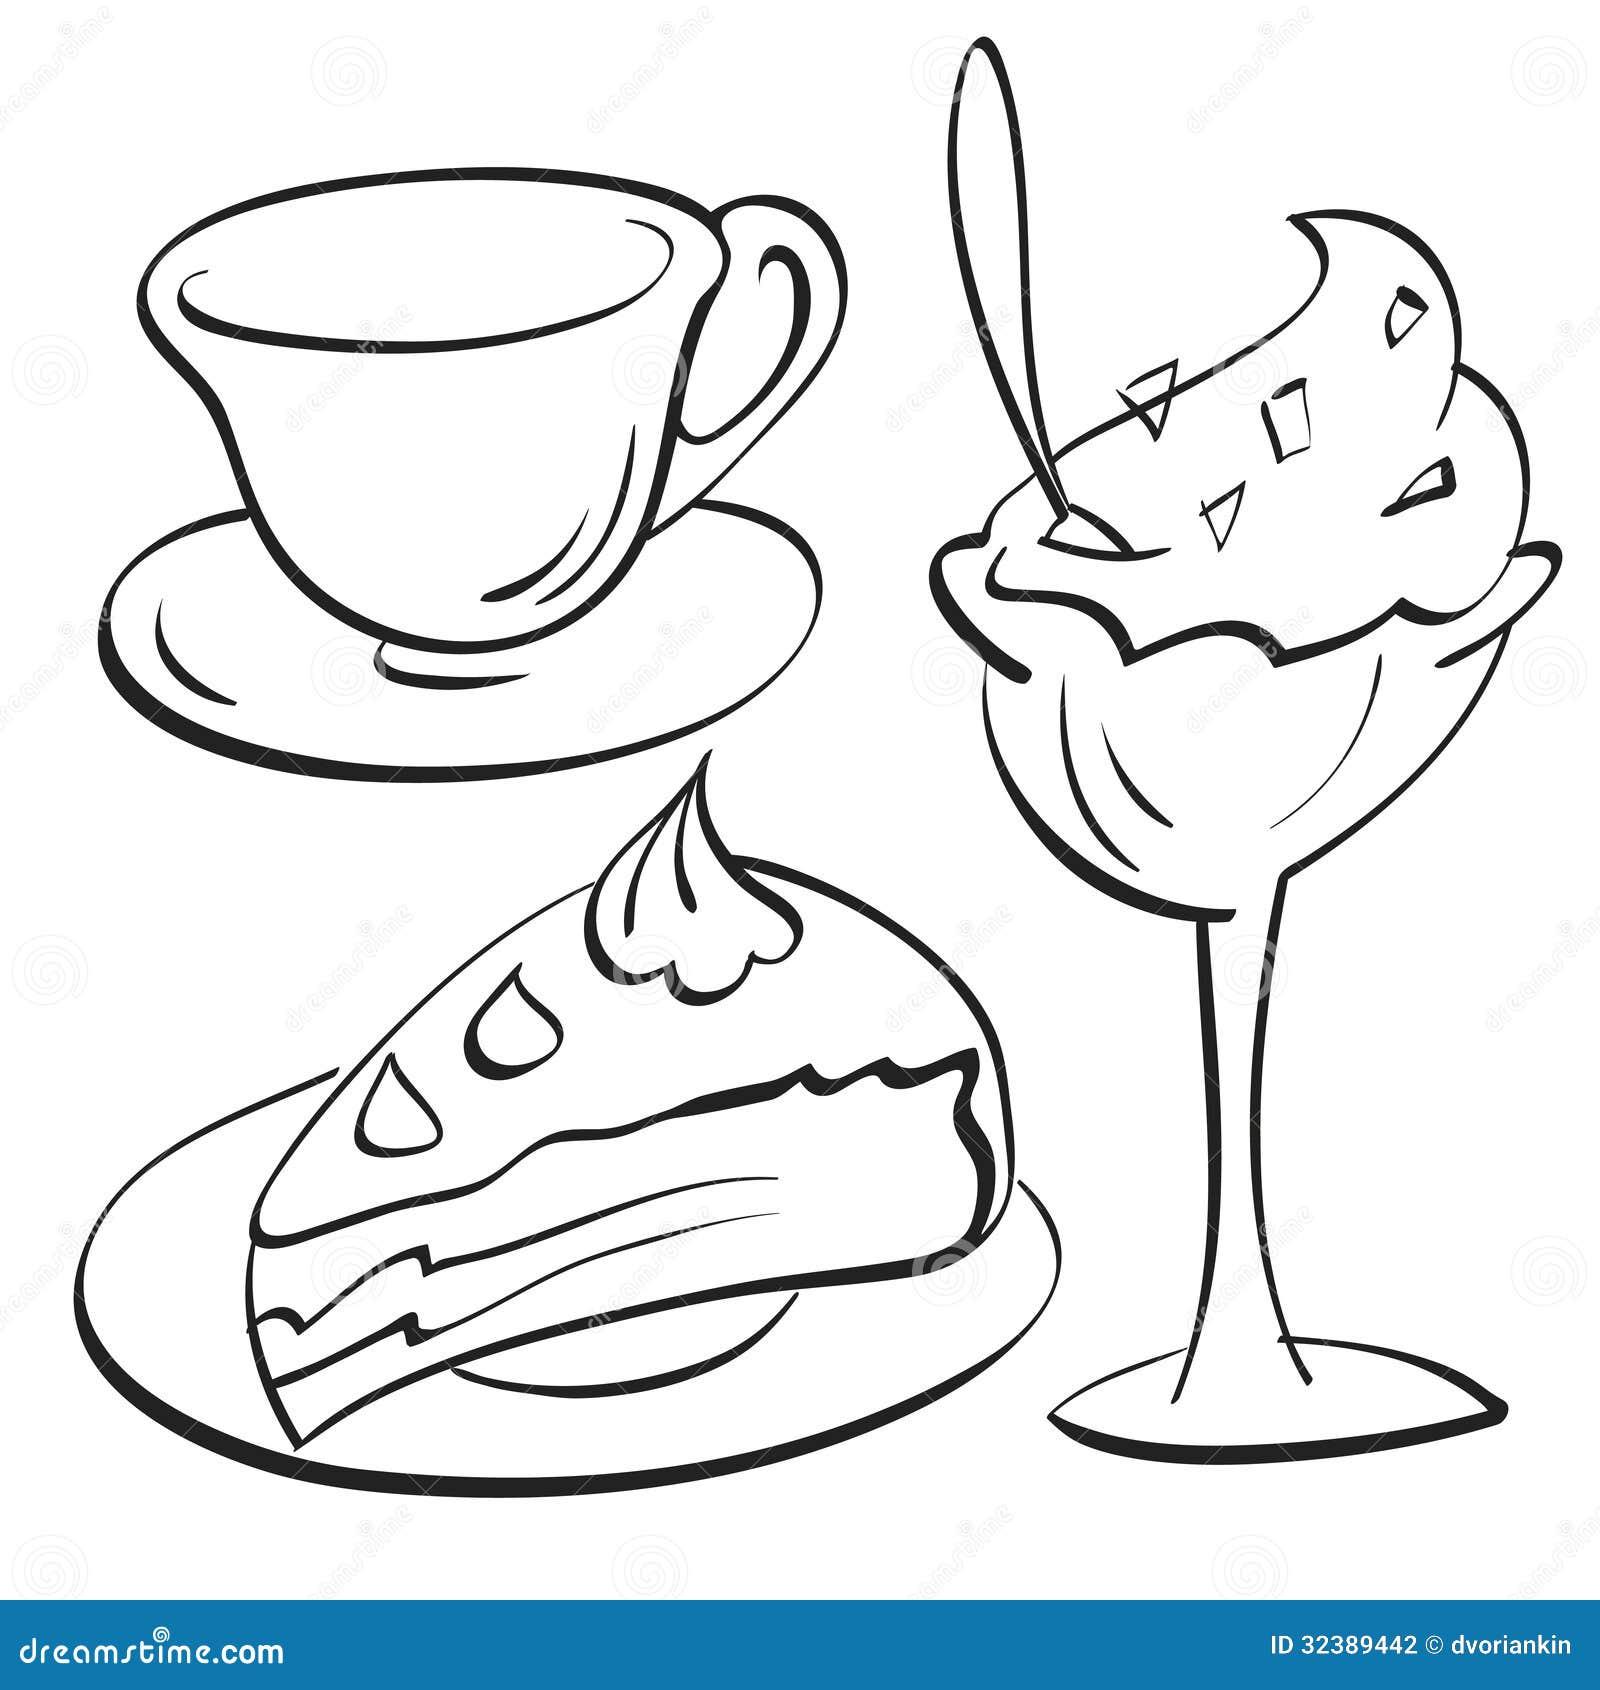 Kleurplaat Fruit Kiwi Cup Cake Sundae Stock Photography Image 32389442